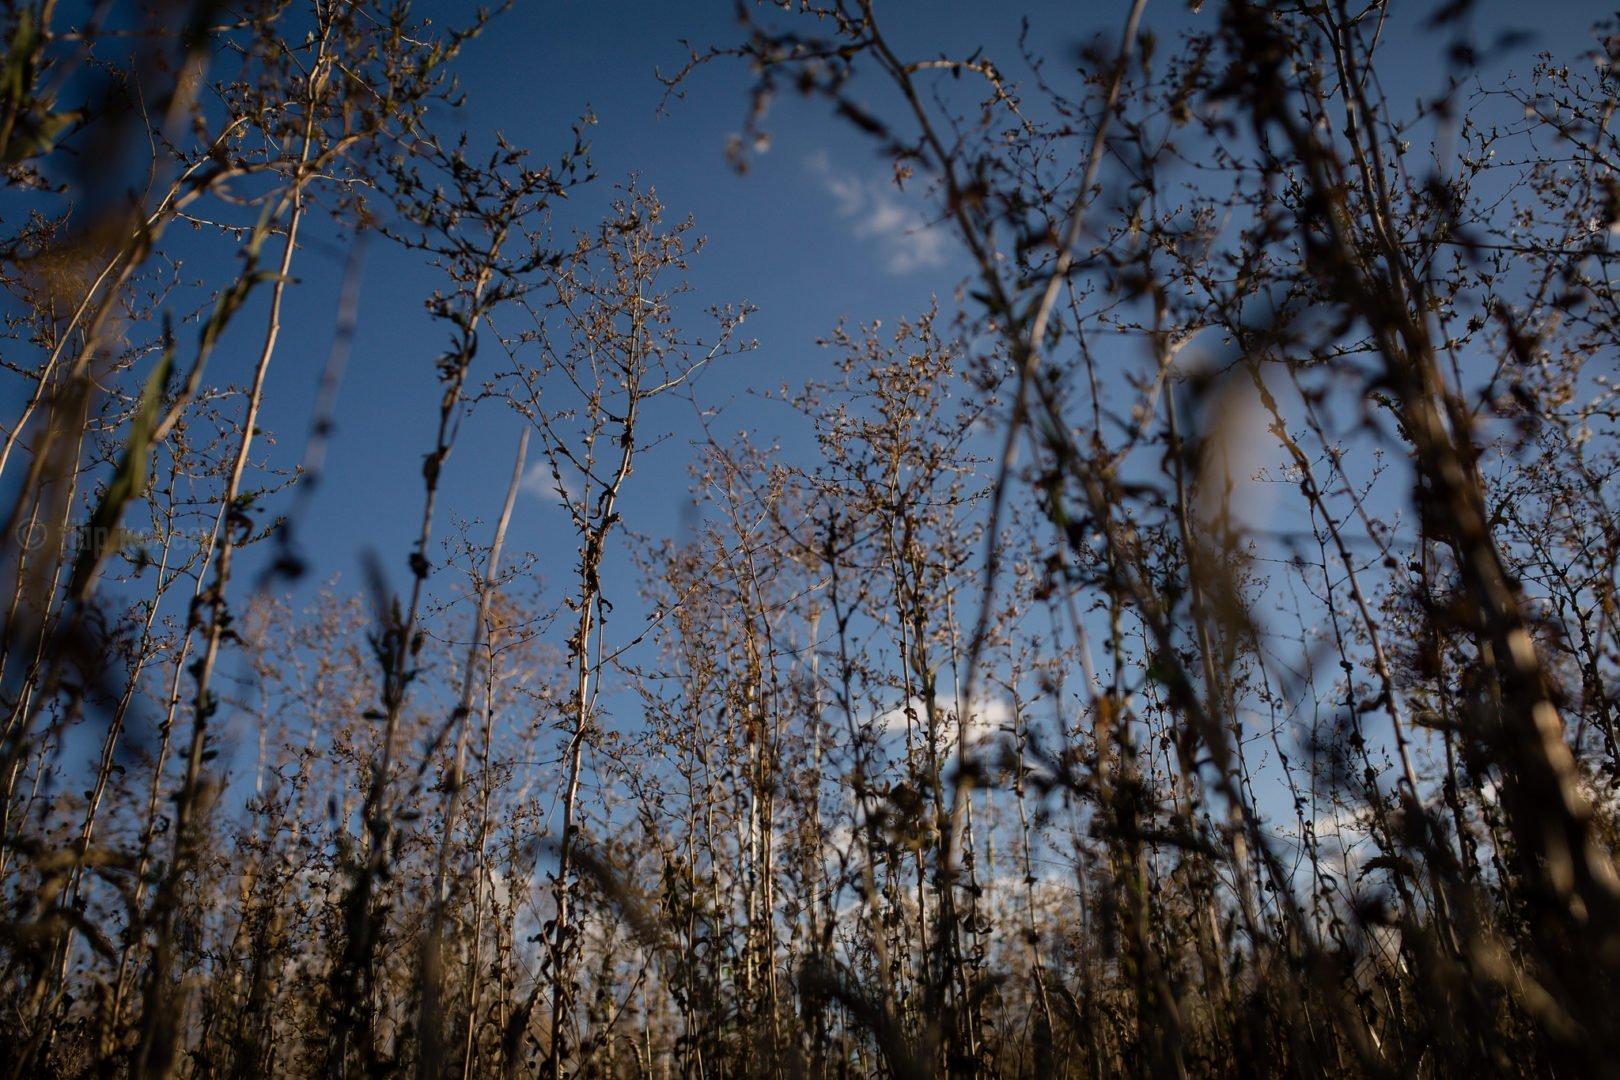 photo of weeds shot against blue sky